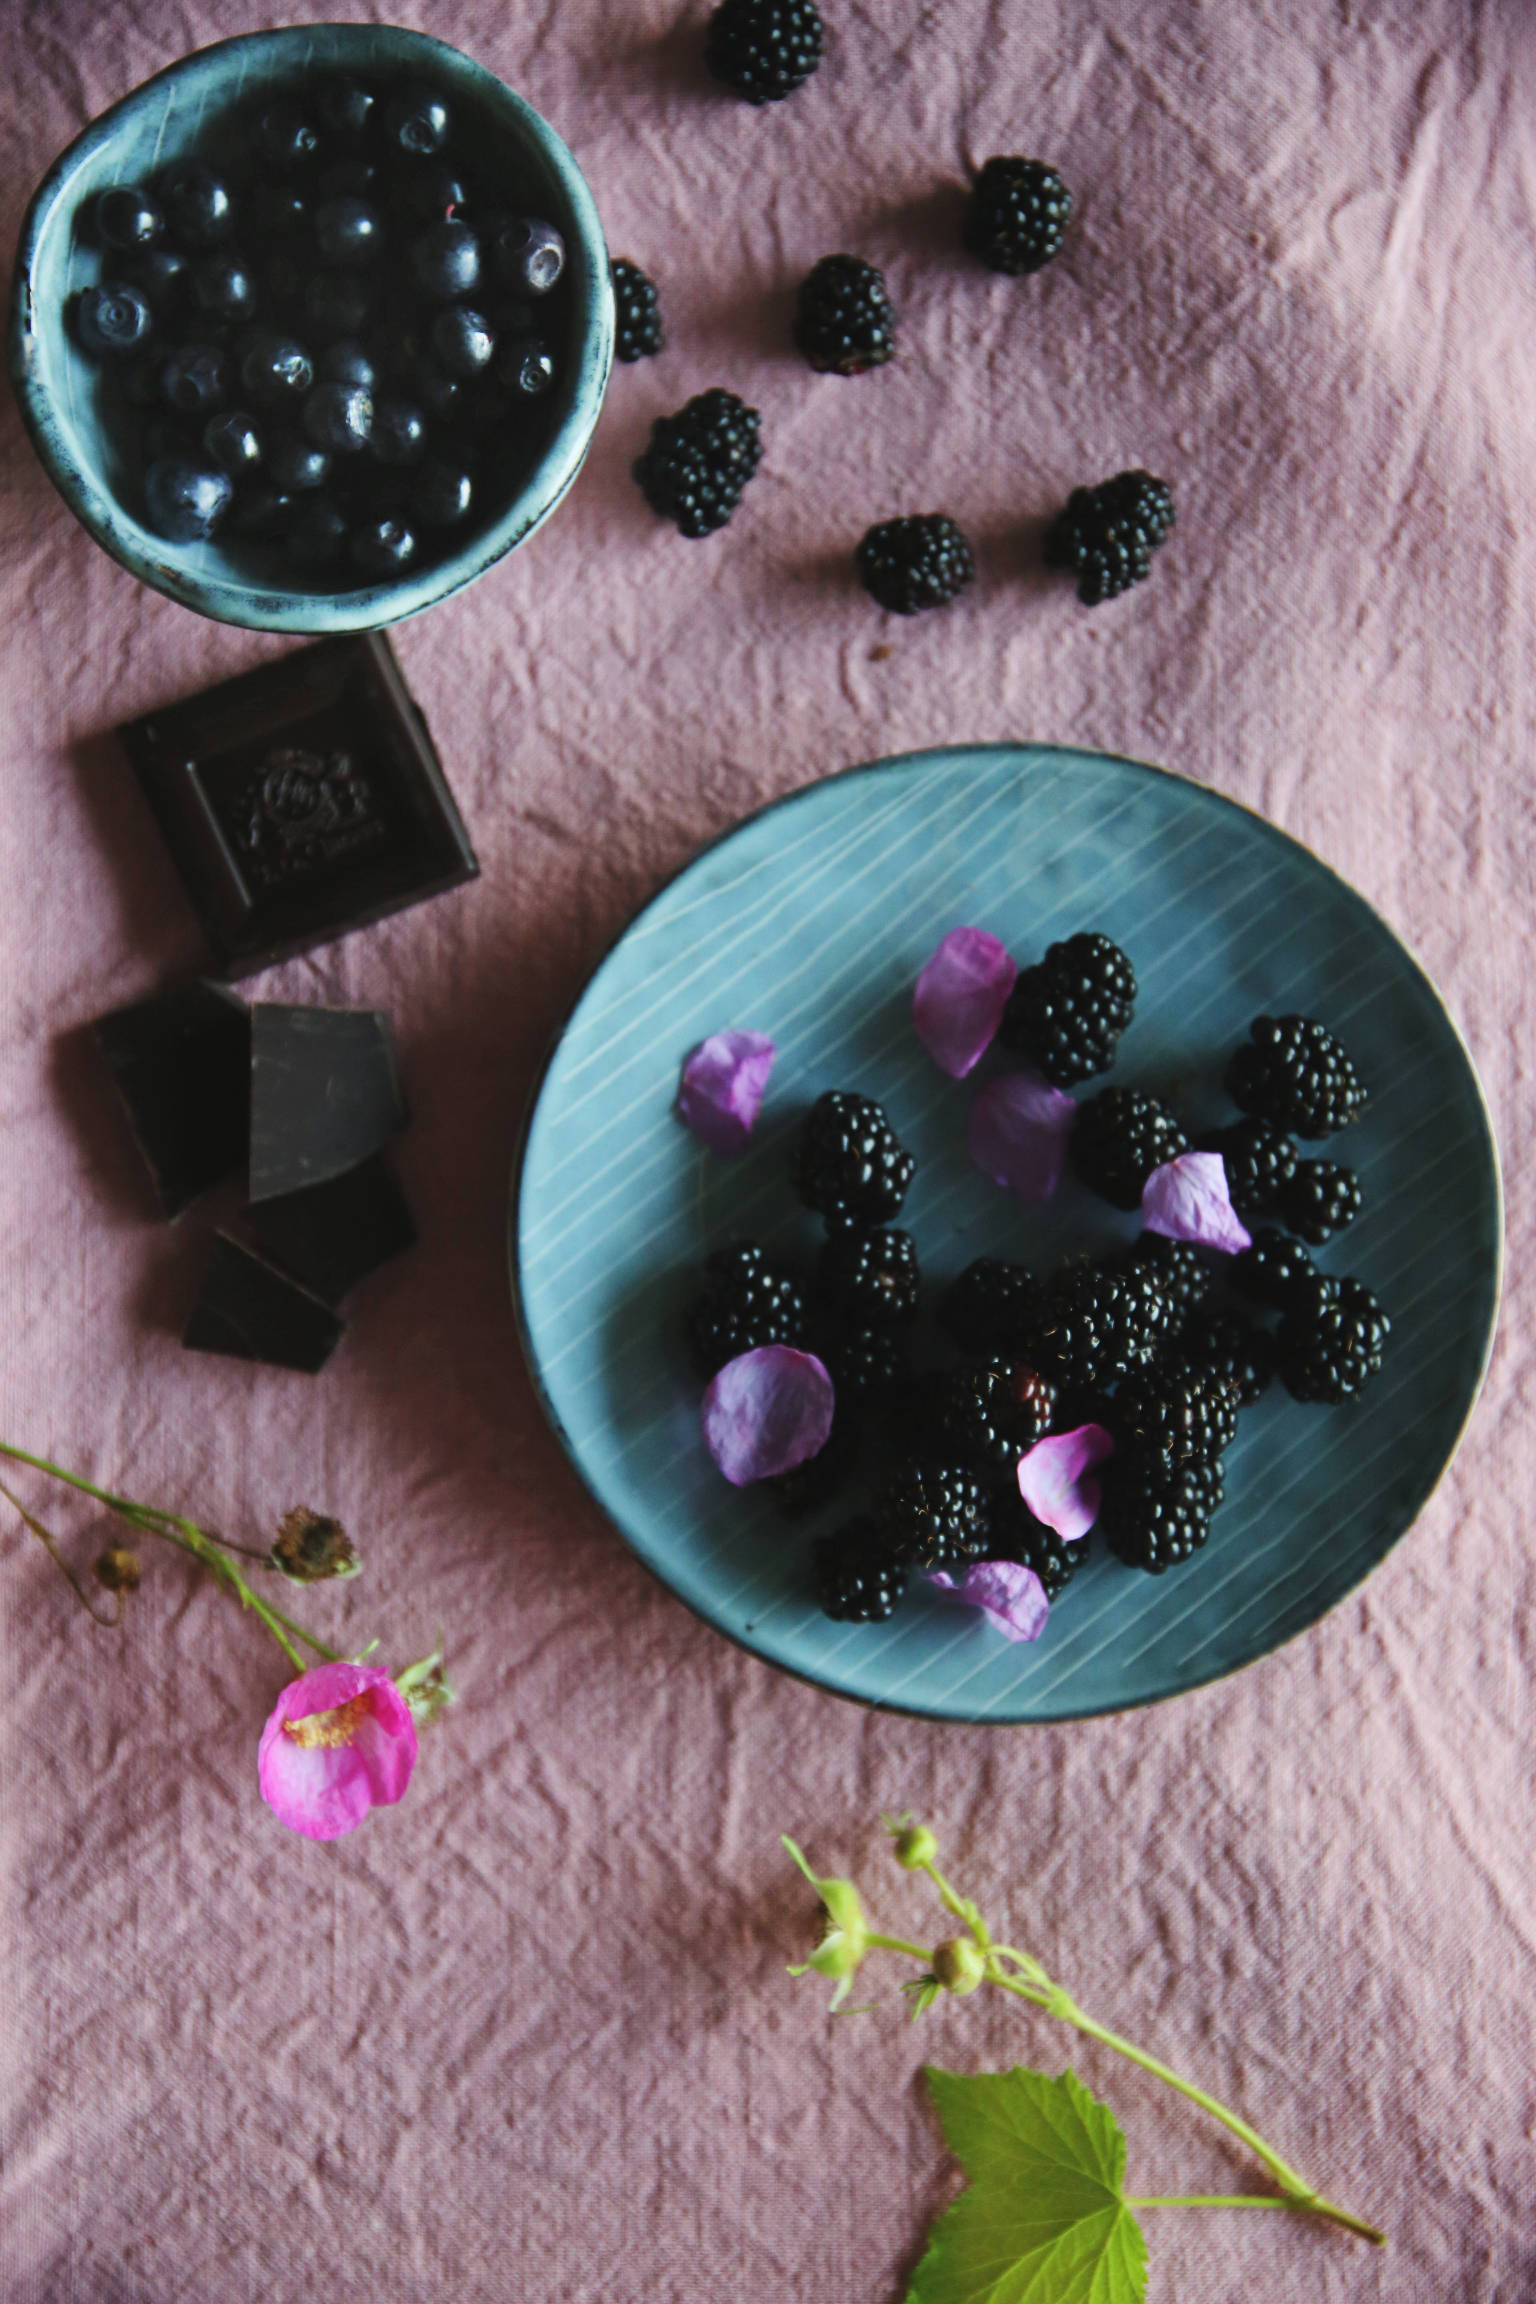 Blackberries and blueberries | Thais FK | Due fili d'erba | Two blades of grass